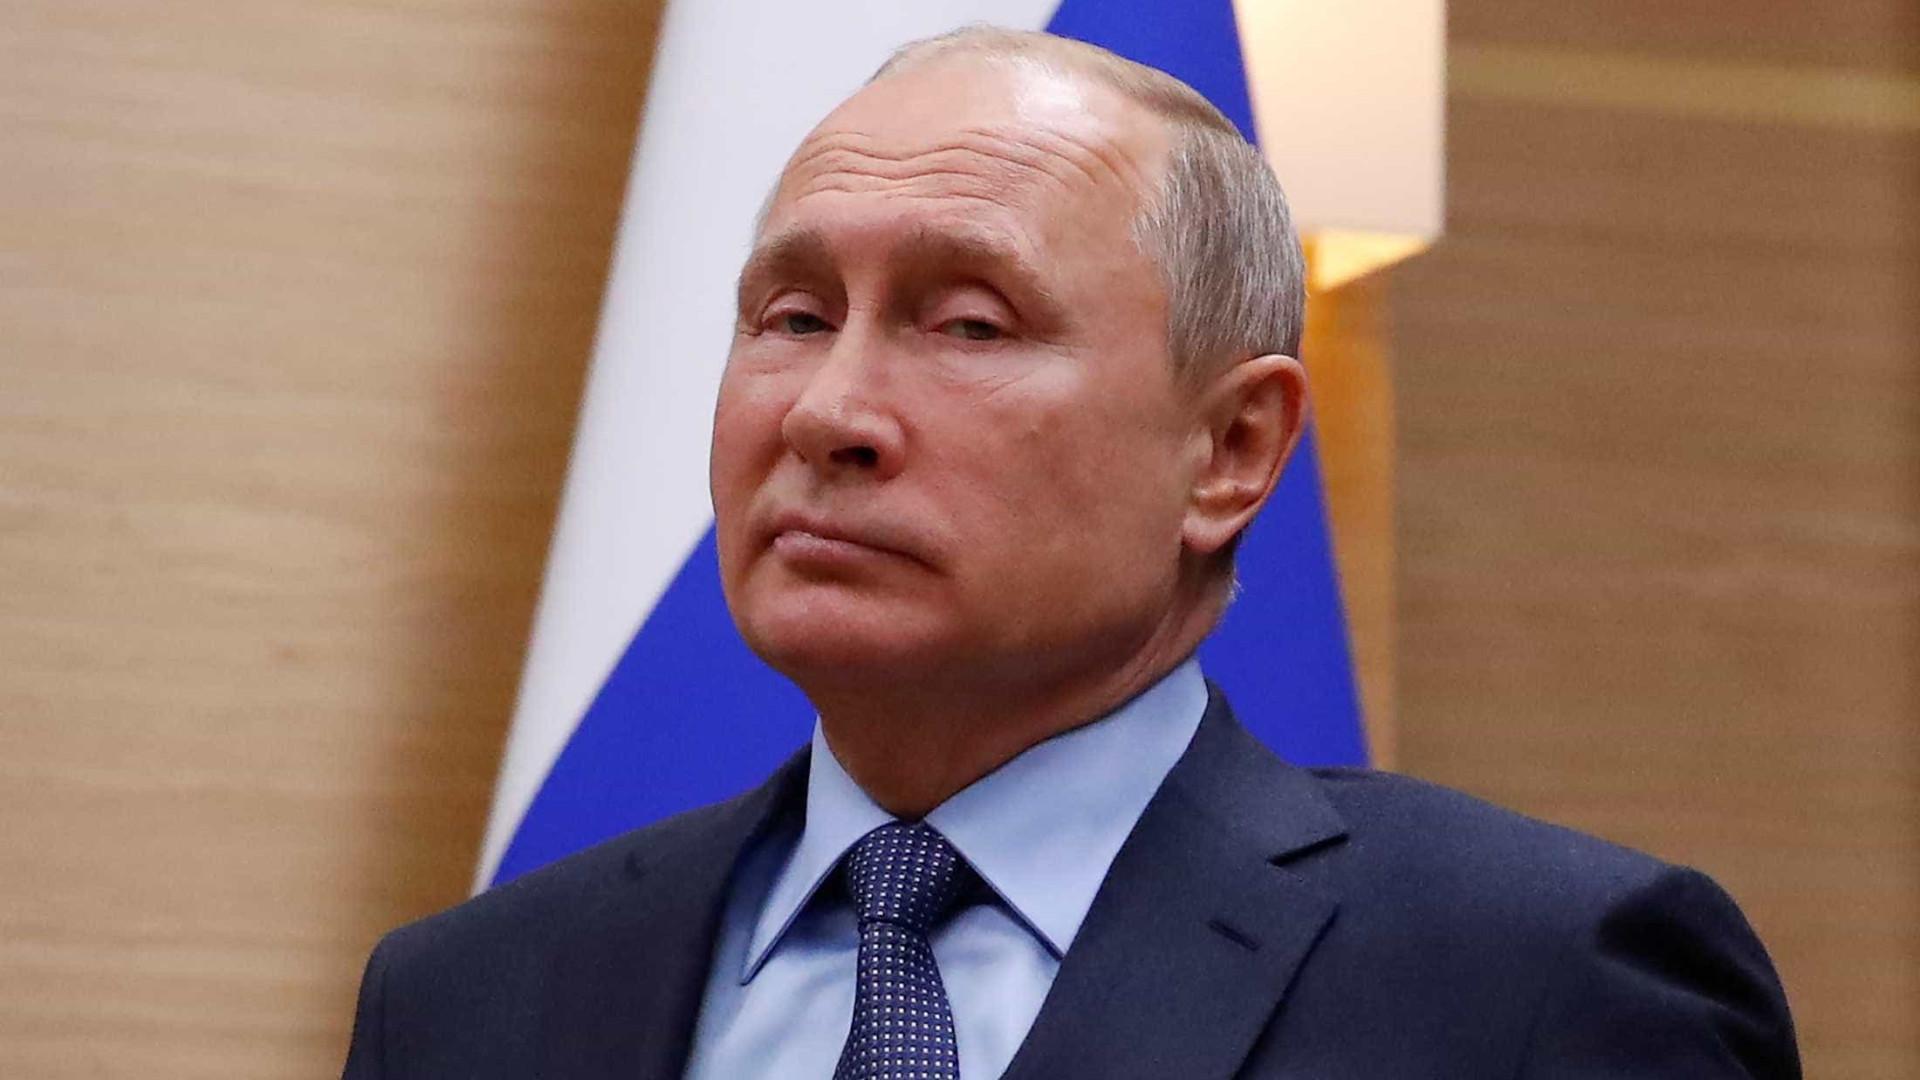 Putin apresenta plano para ficar no poder após 2024, premiê renuncia